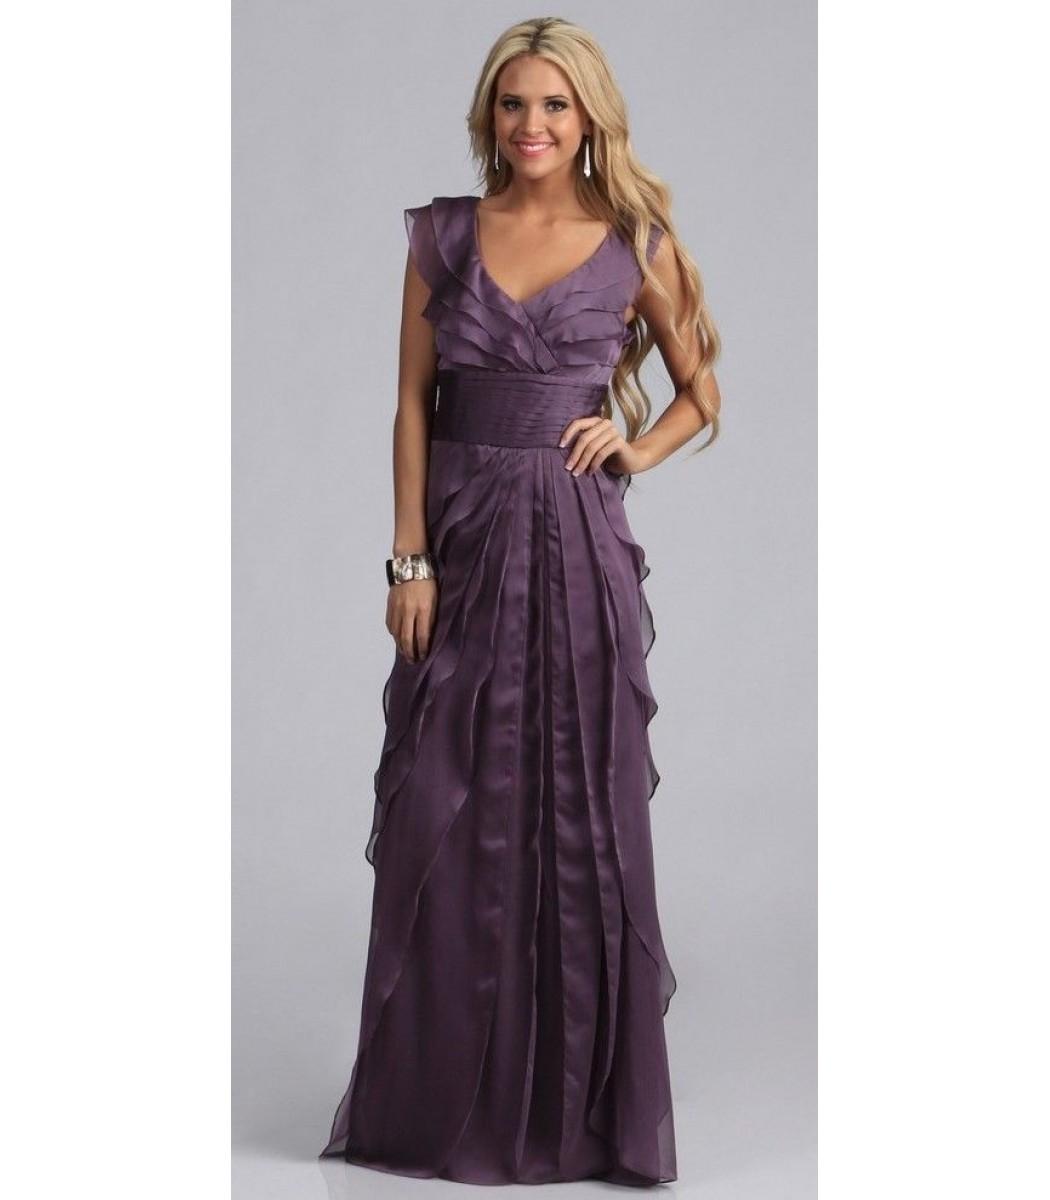 ADRIANNA PAPELL 081844460 Eggplant Purple Chiffon Gown Dress Sz 6 8 ...